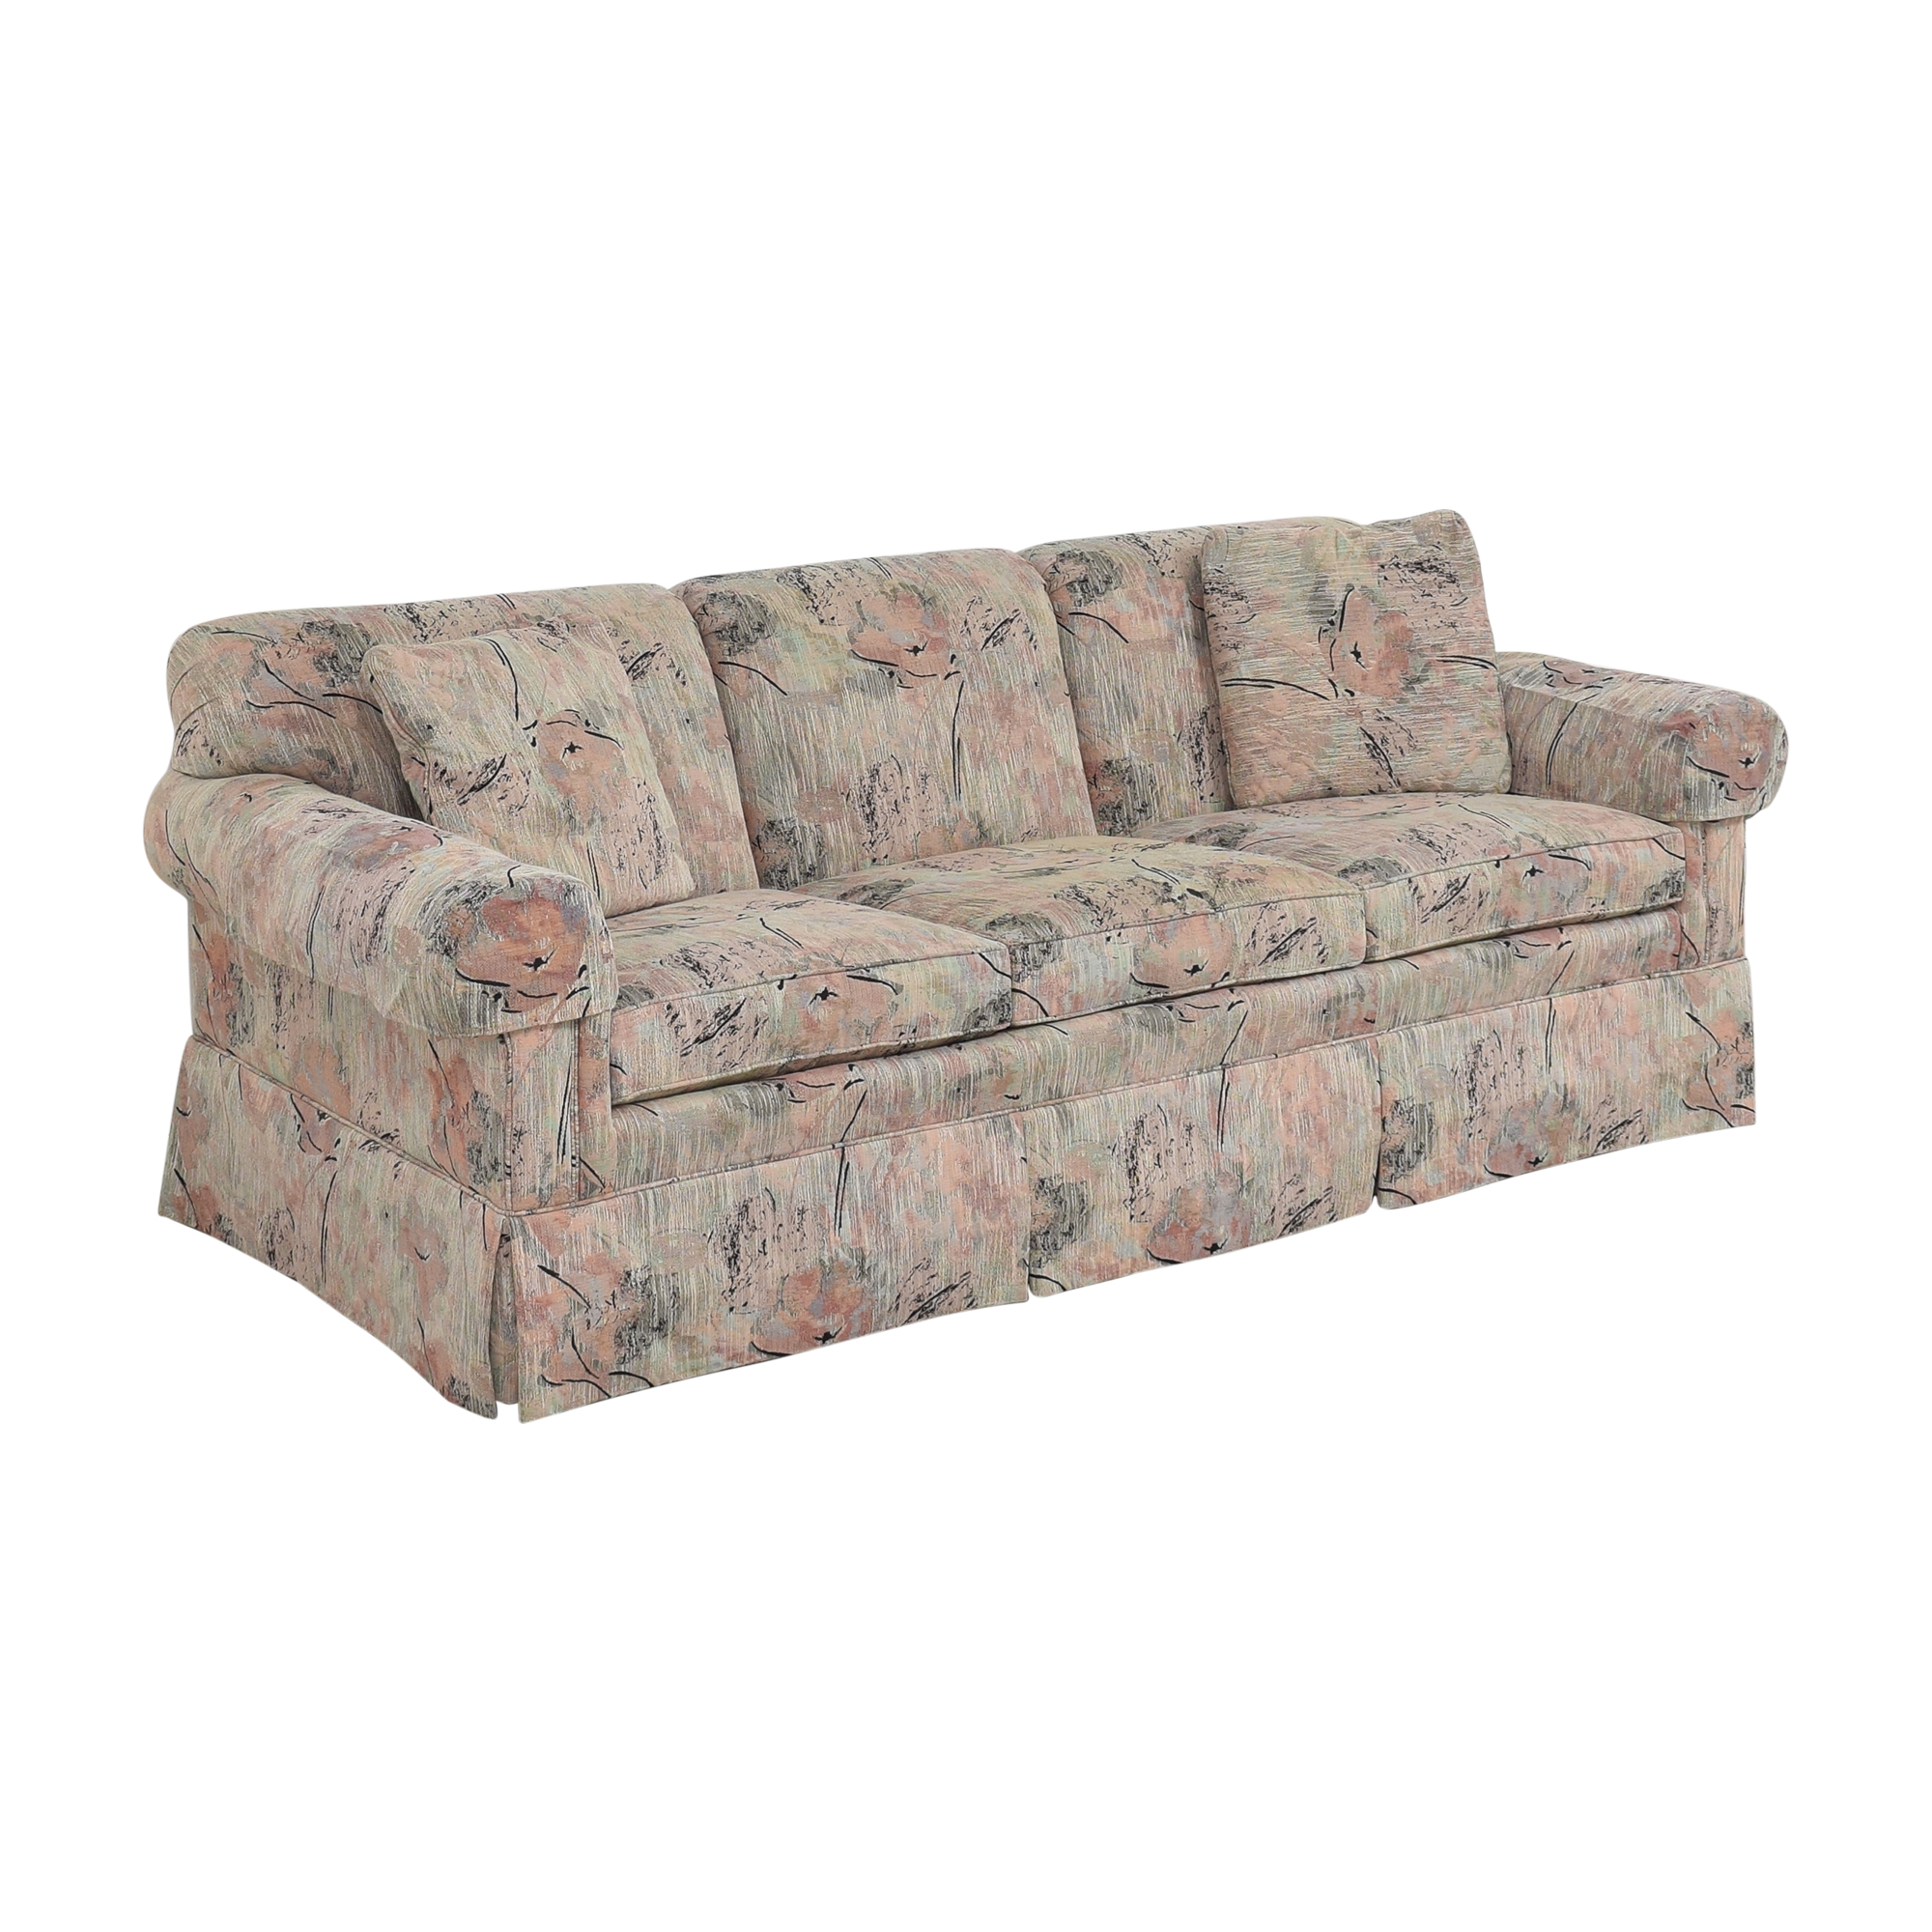 Ethan Allen Ethan Allen Traditional Classics Roll Arm Sofa on sale